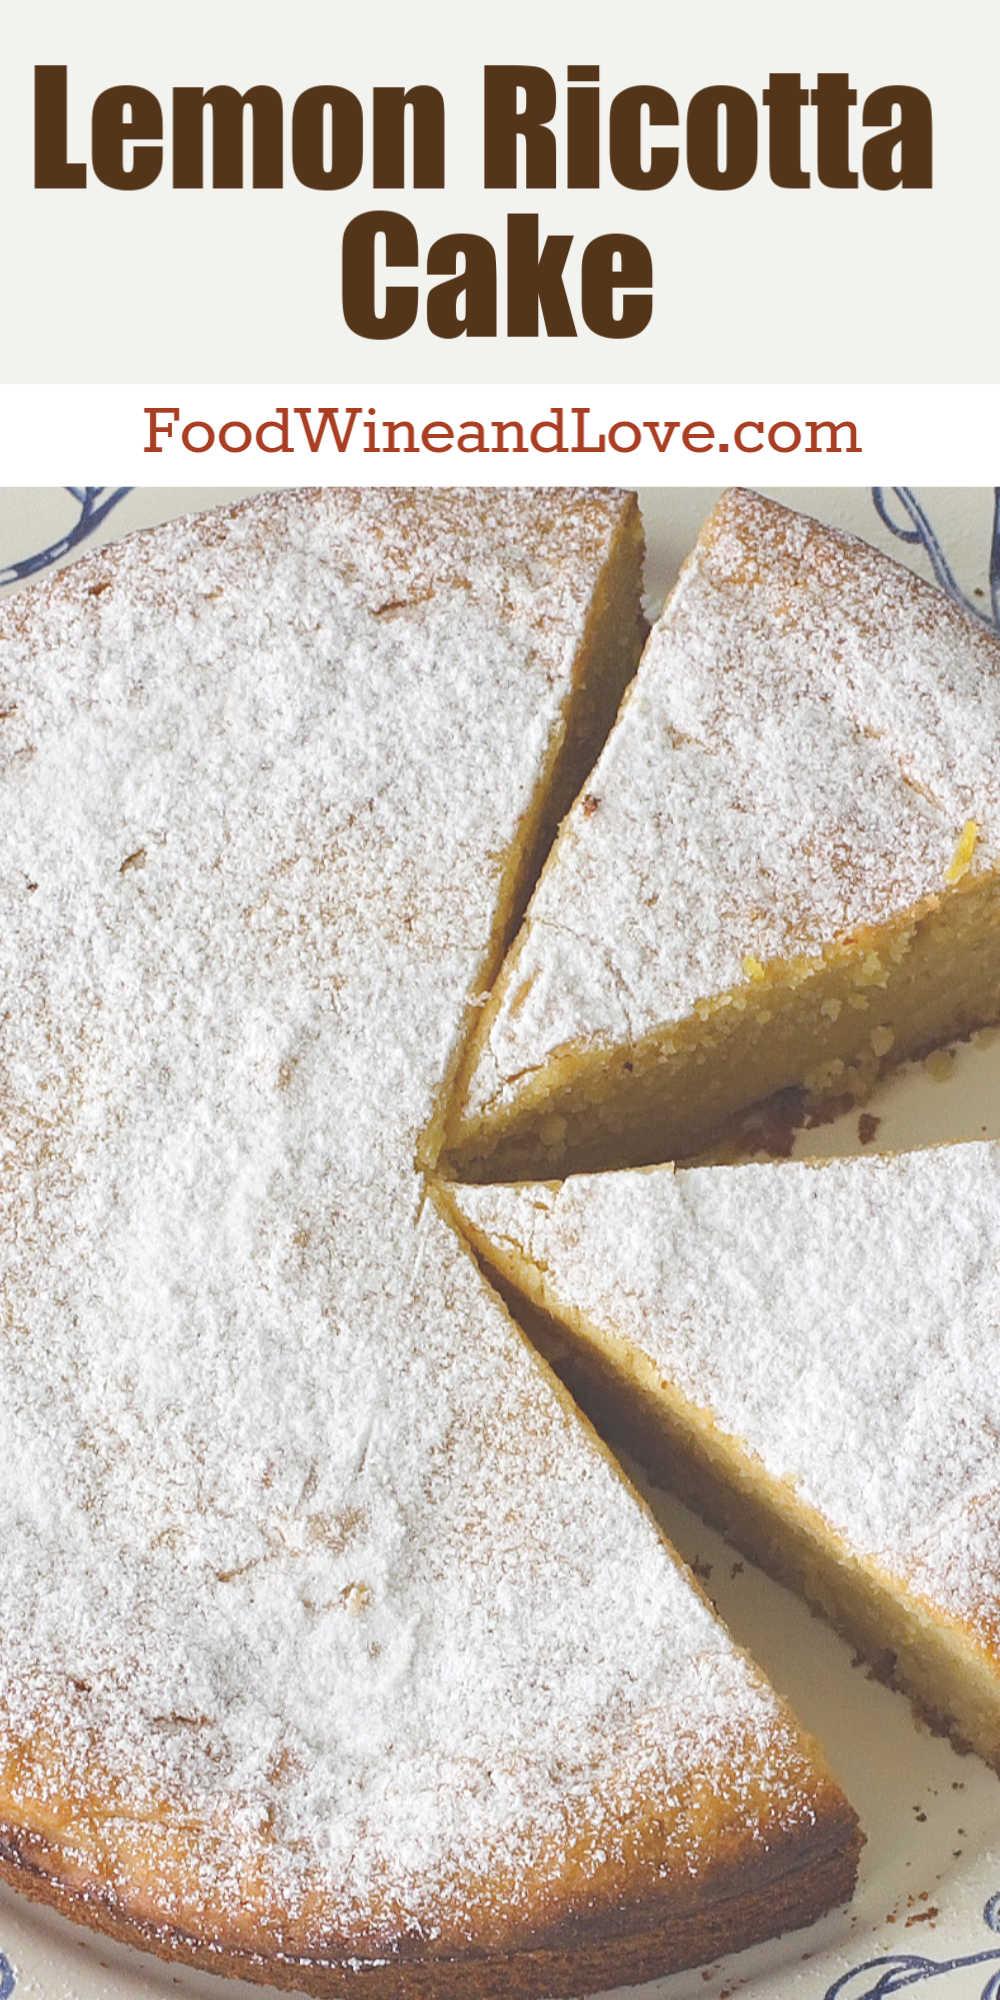 mediterranean diet recipes lemon cake